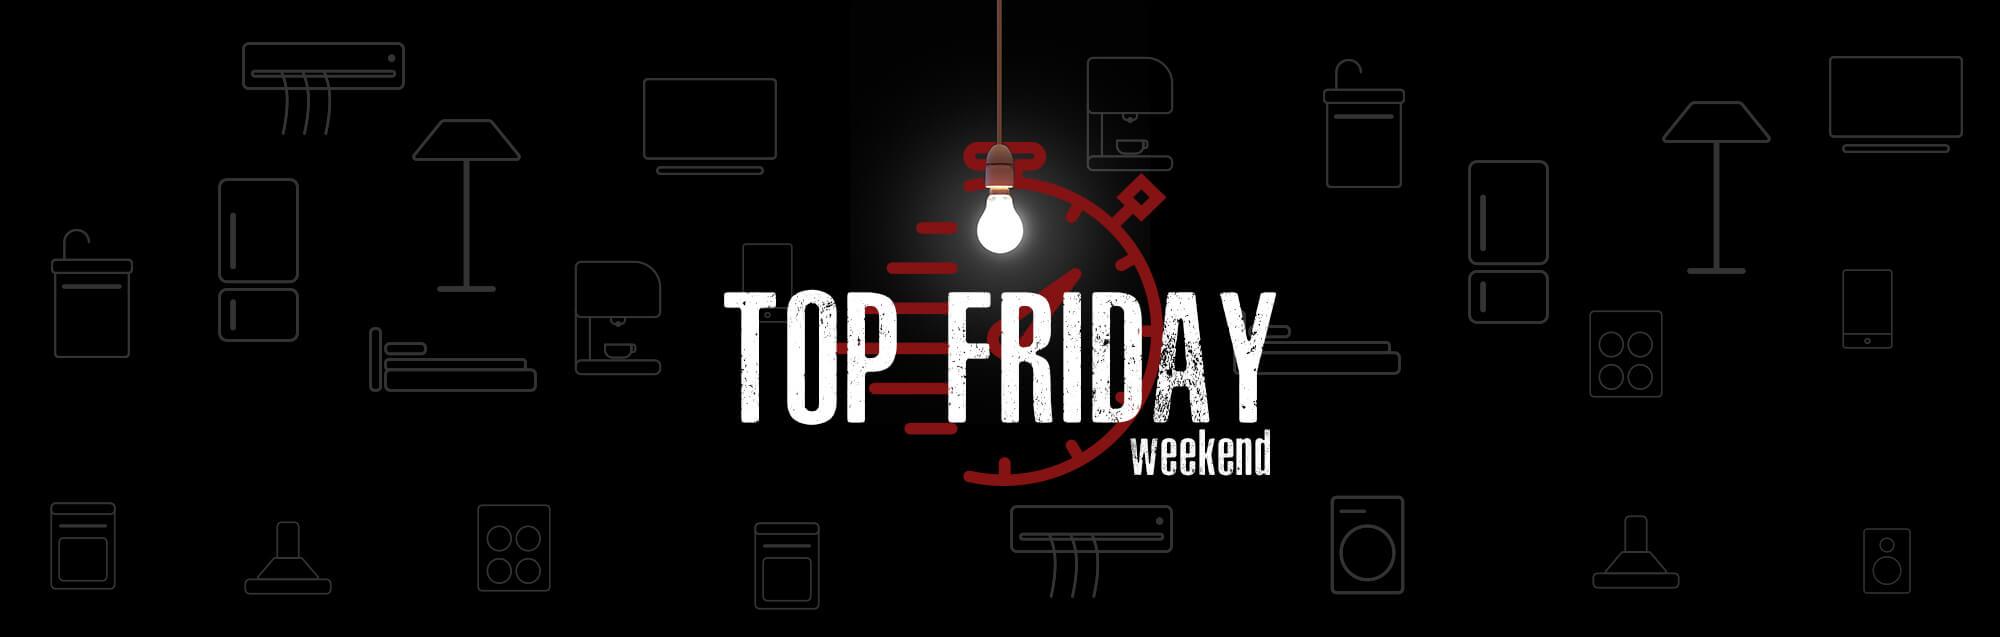 TOP FRIDAY weekend